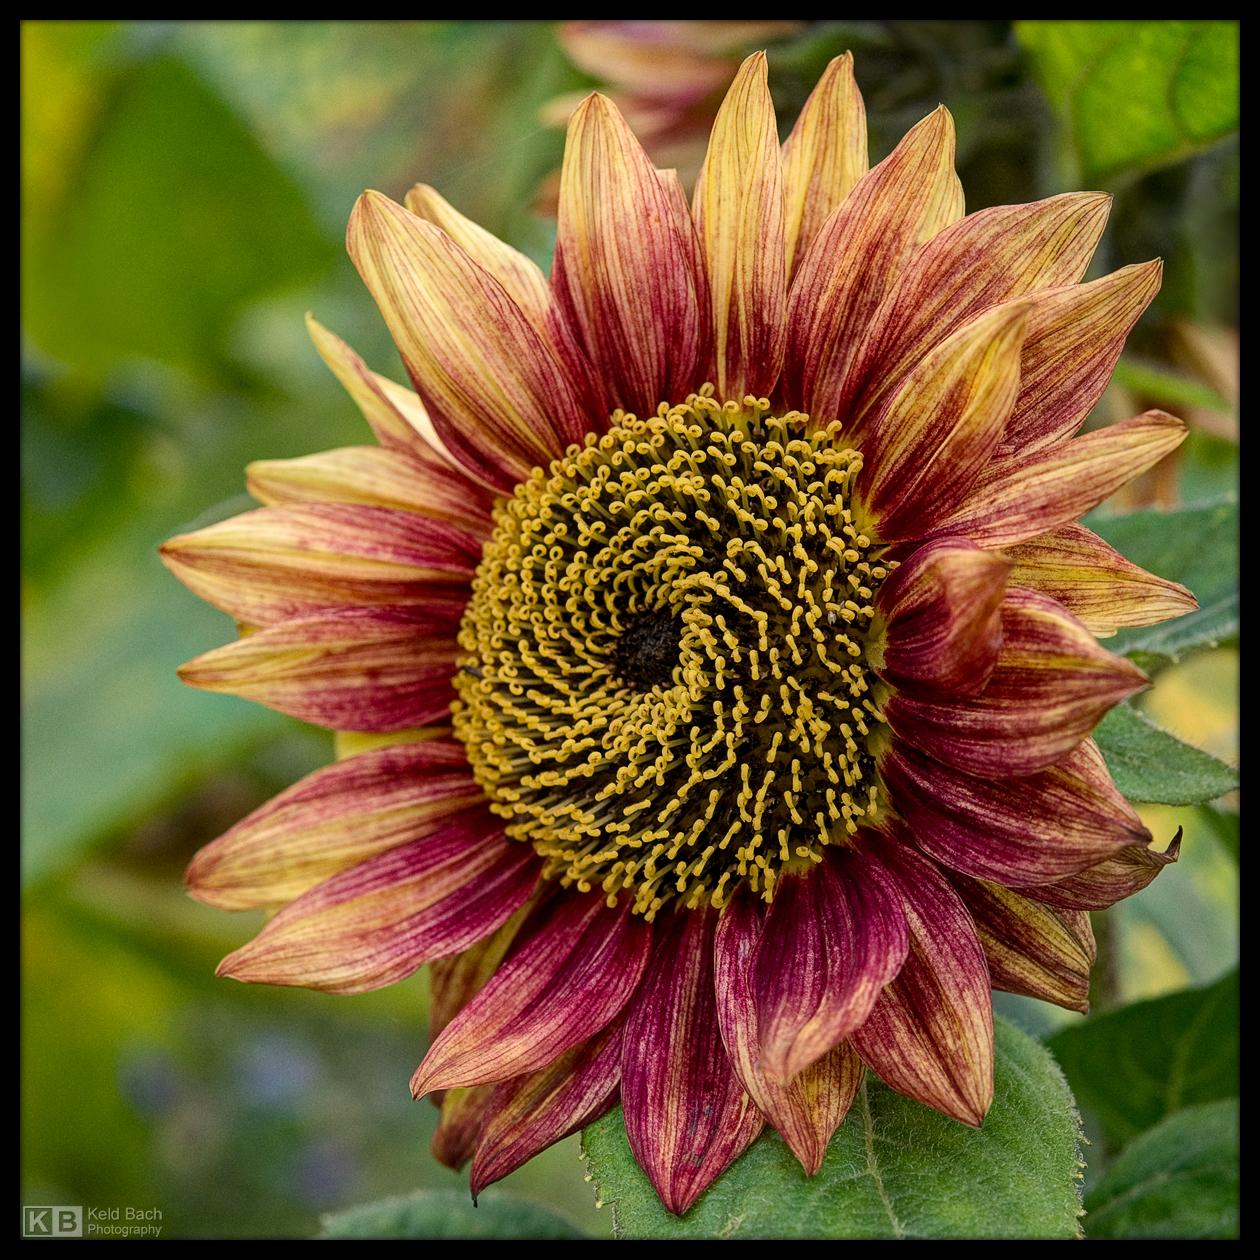 Peach-Coloured Sunflower by KeldBach